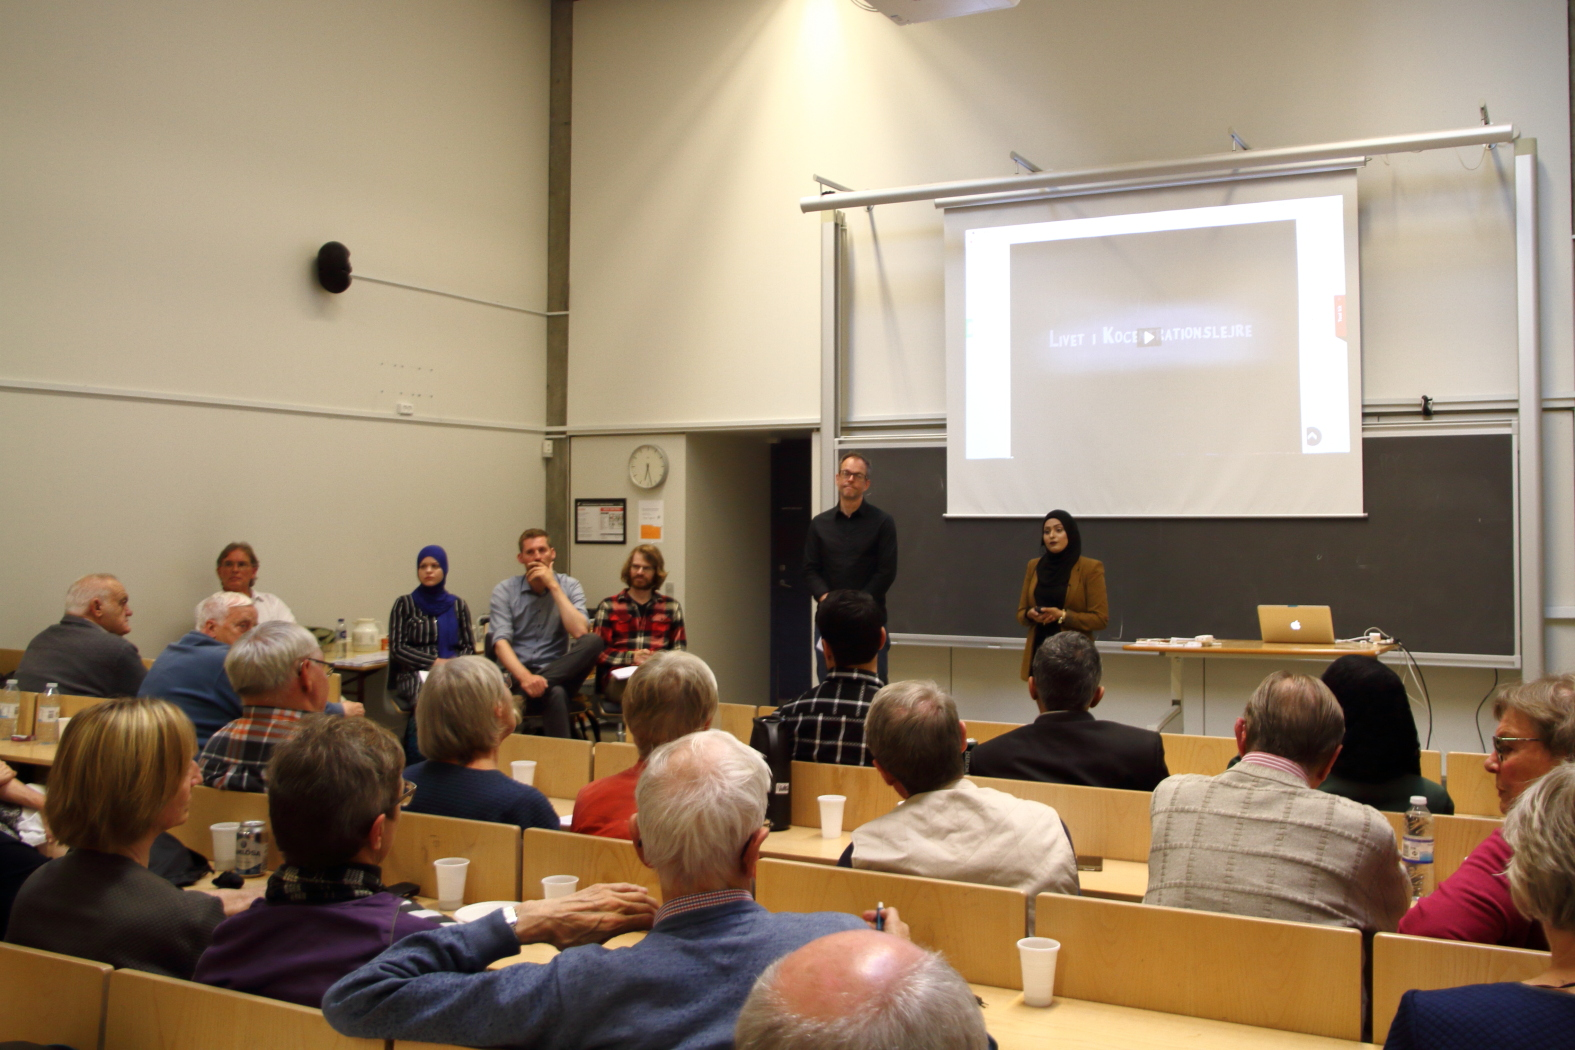 IWitness Presentations at University of Southern Denmark